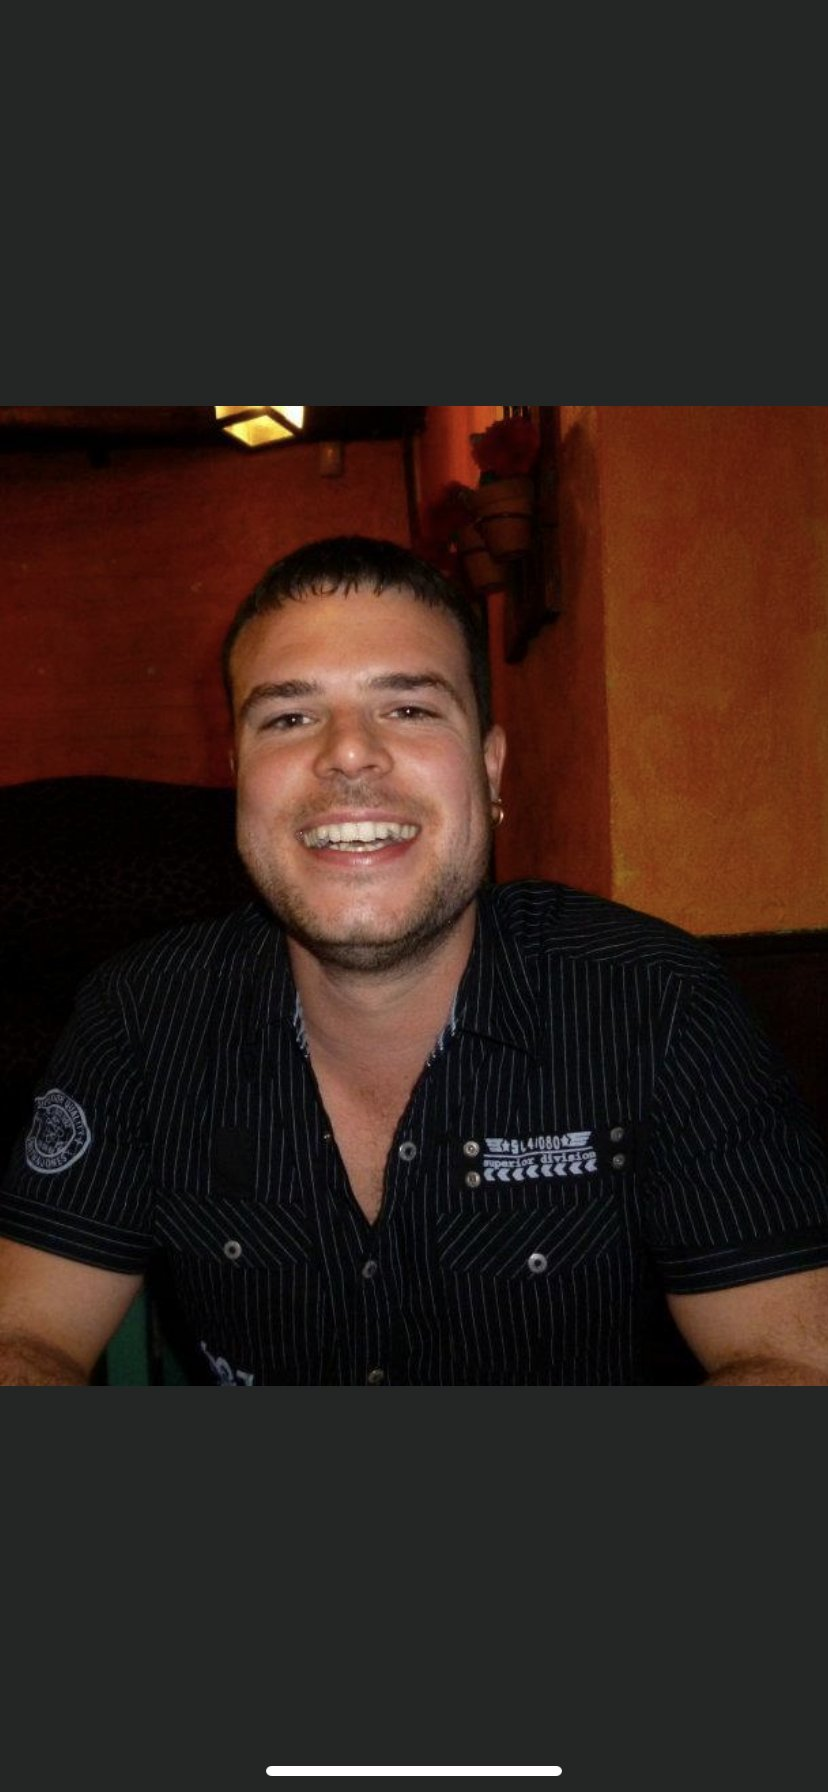 Sean678. from Kent,United Kingdom